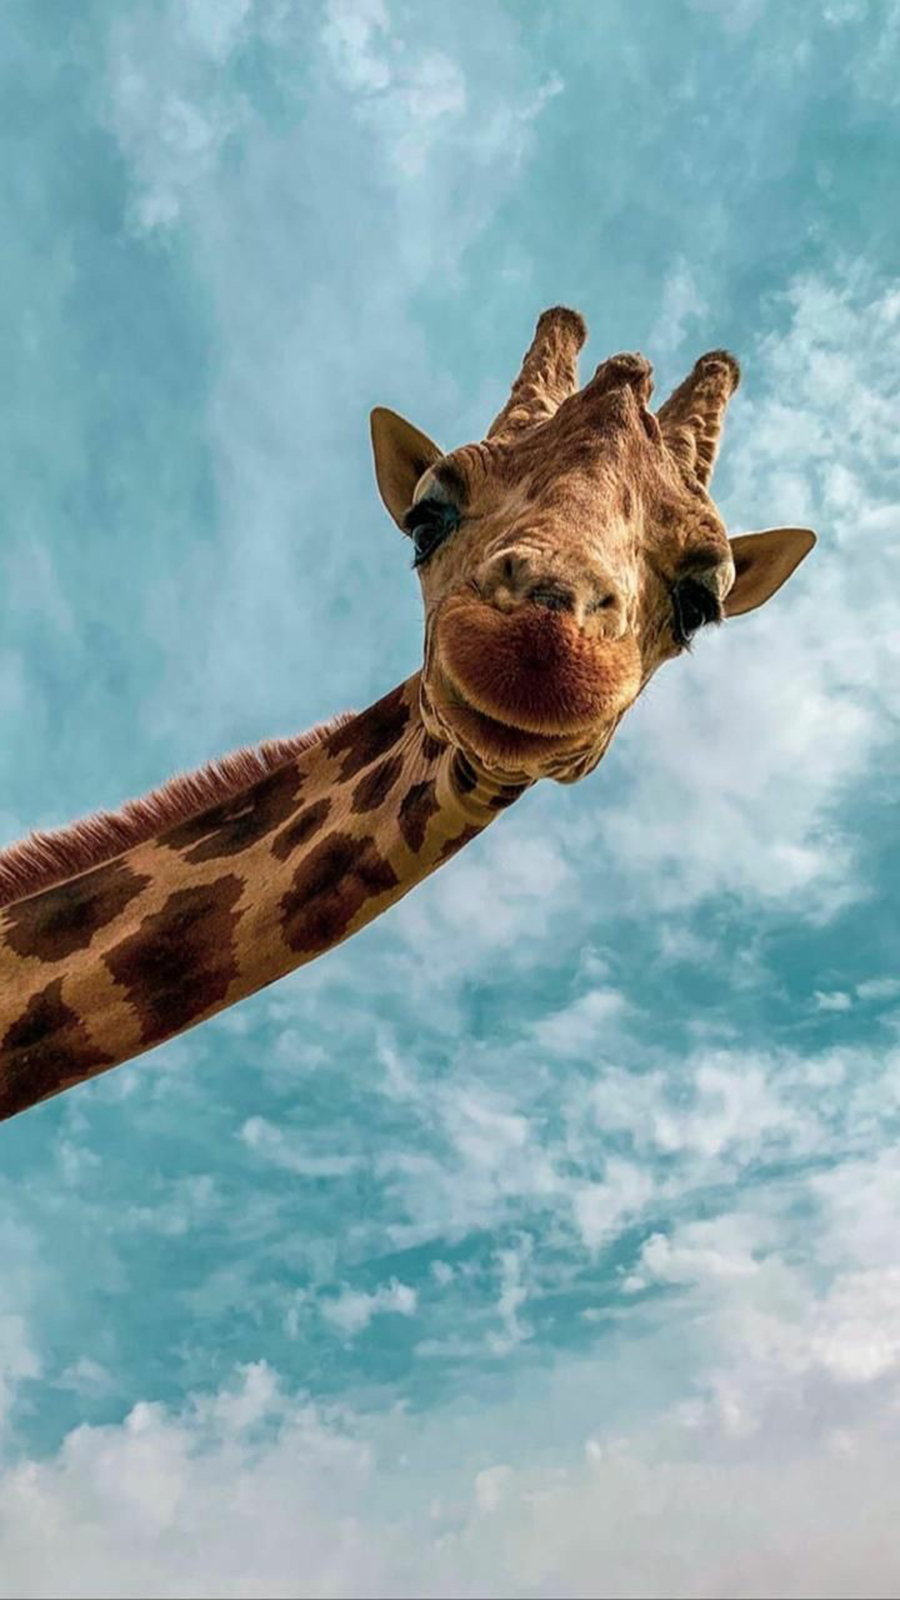 Top Giraffe Phone Wallpapers Free Download – Best Wallpapers